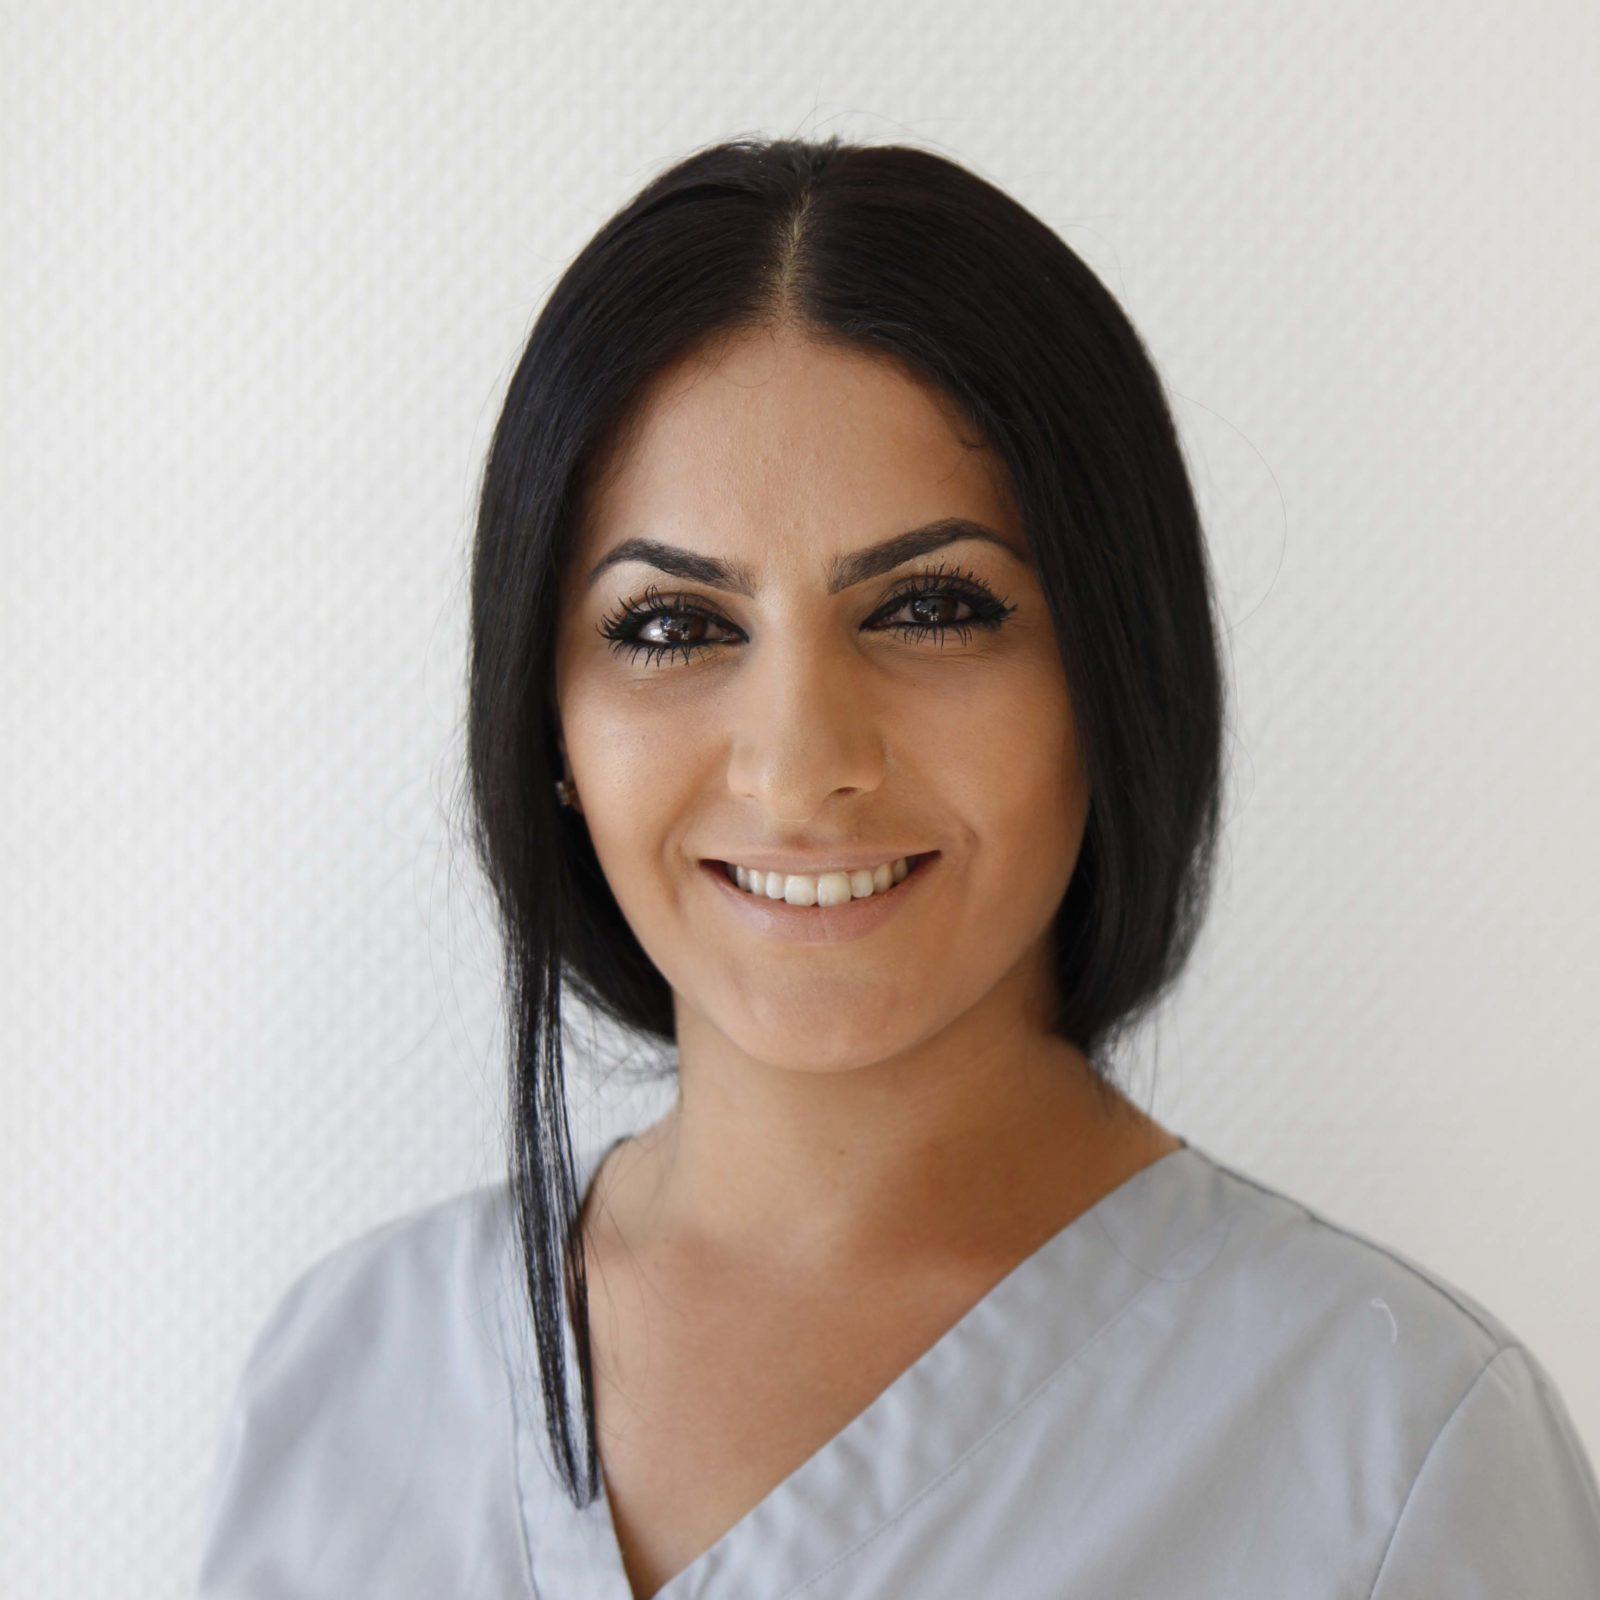 Maryam Asadi